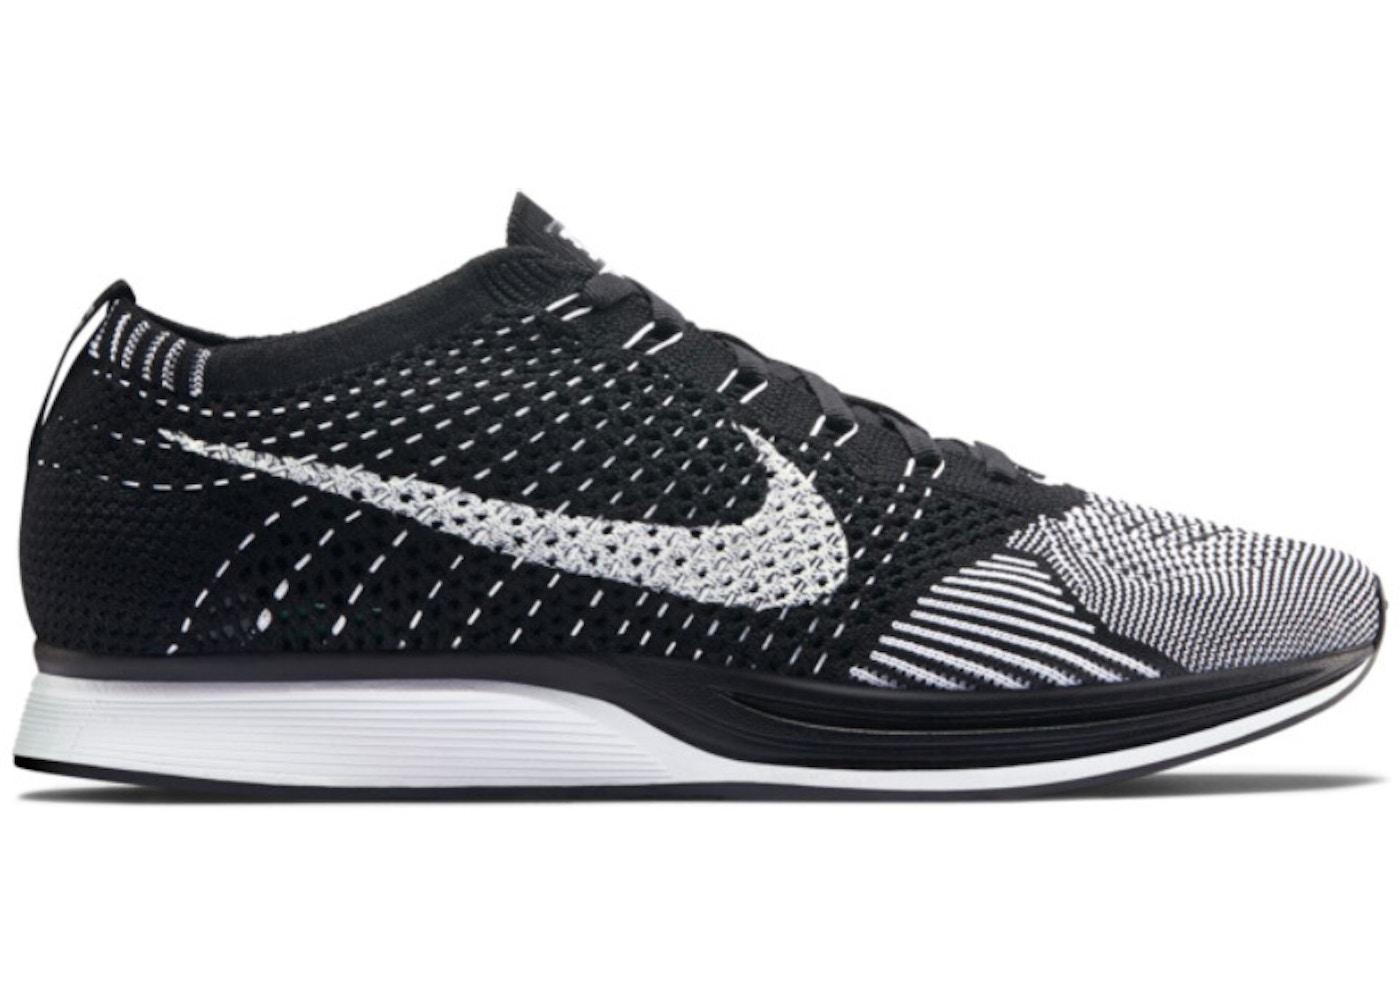 81f90277180d2 Nike Flyknit Racer Black Tongue - 526628-002